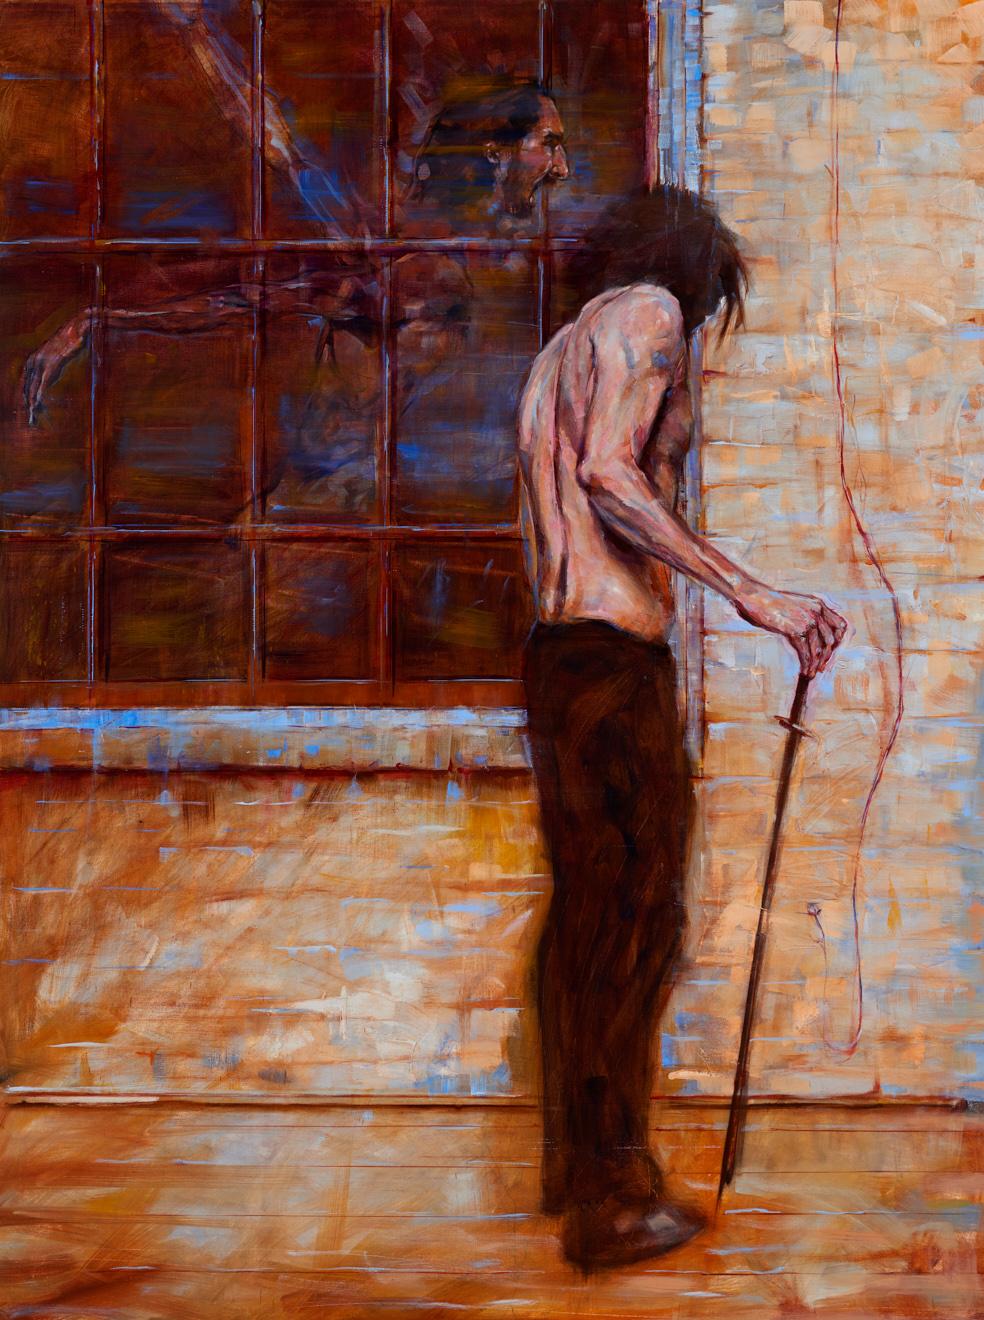 Triumph of Wisdom Over Death  2017, oil on canvas, 48 x 36in